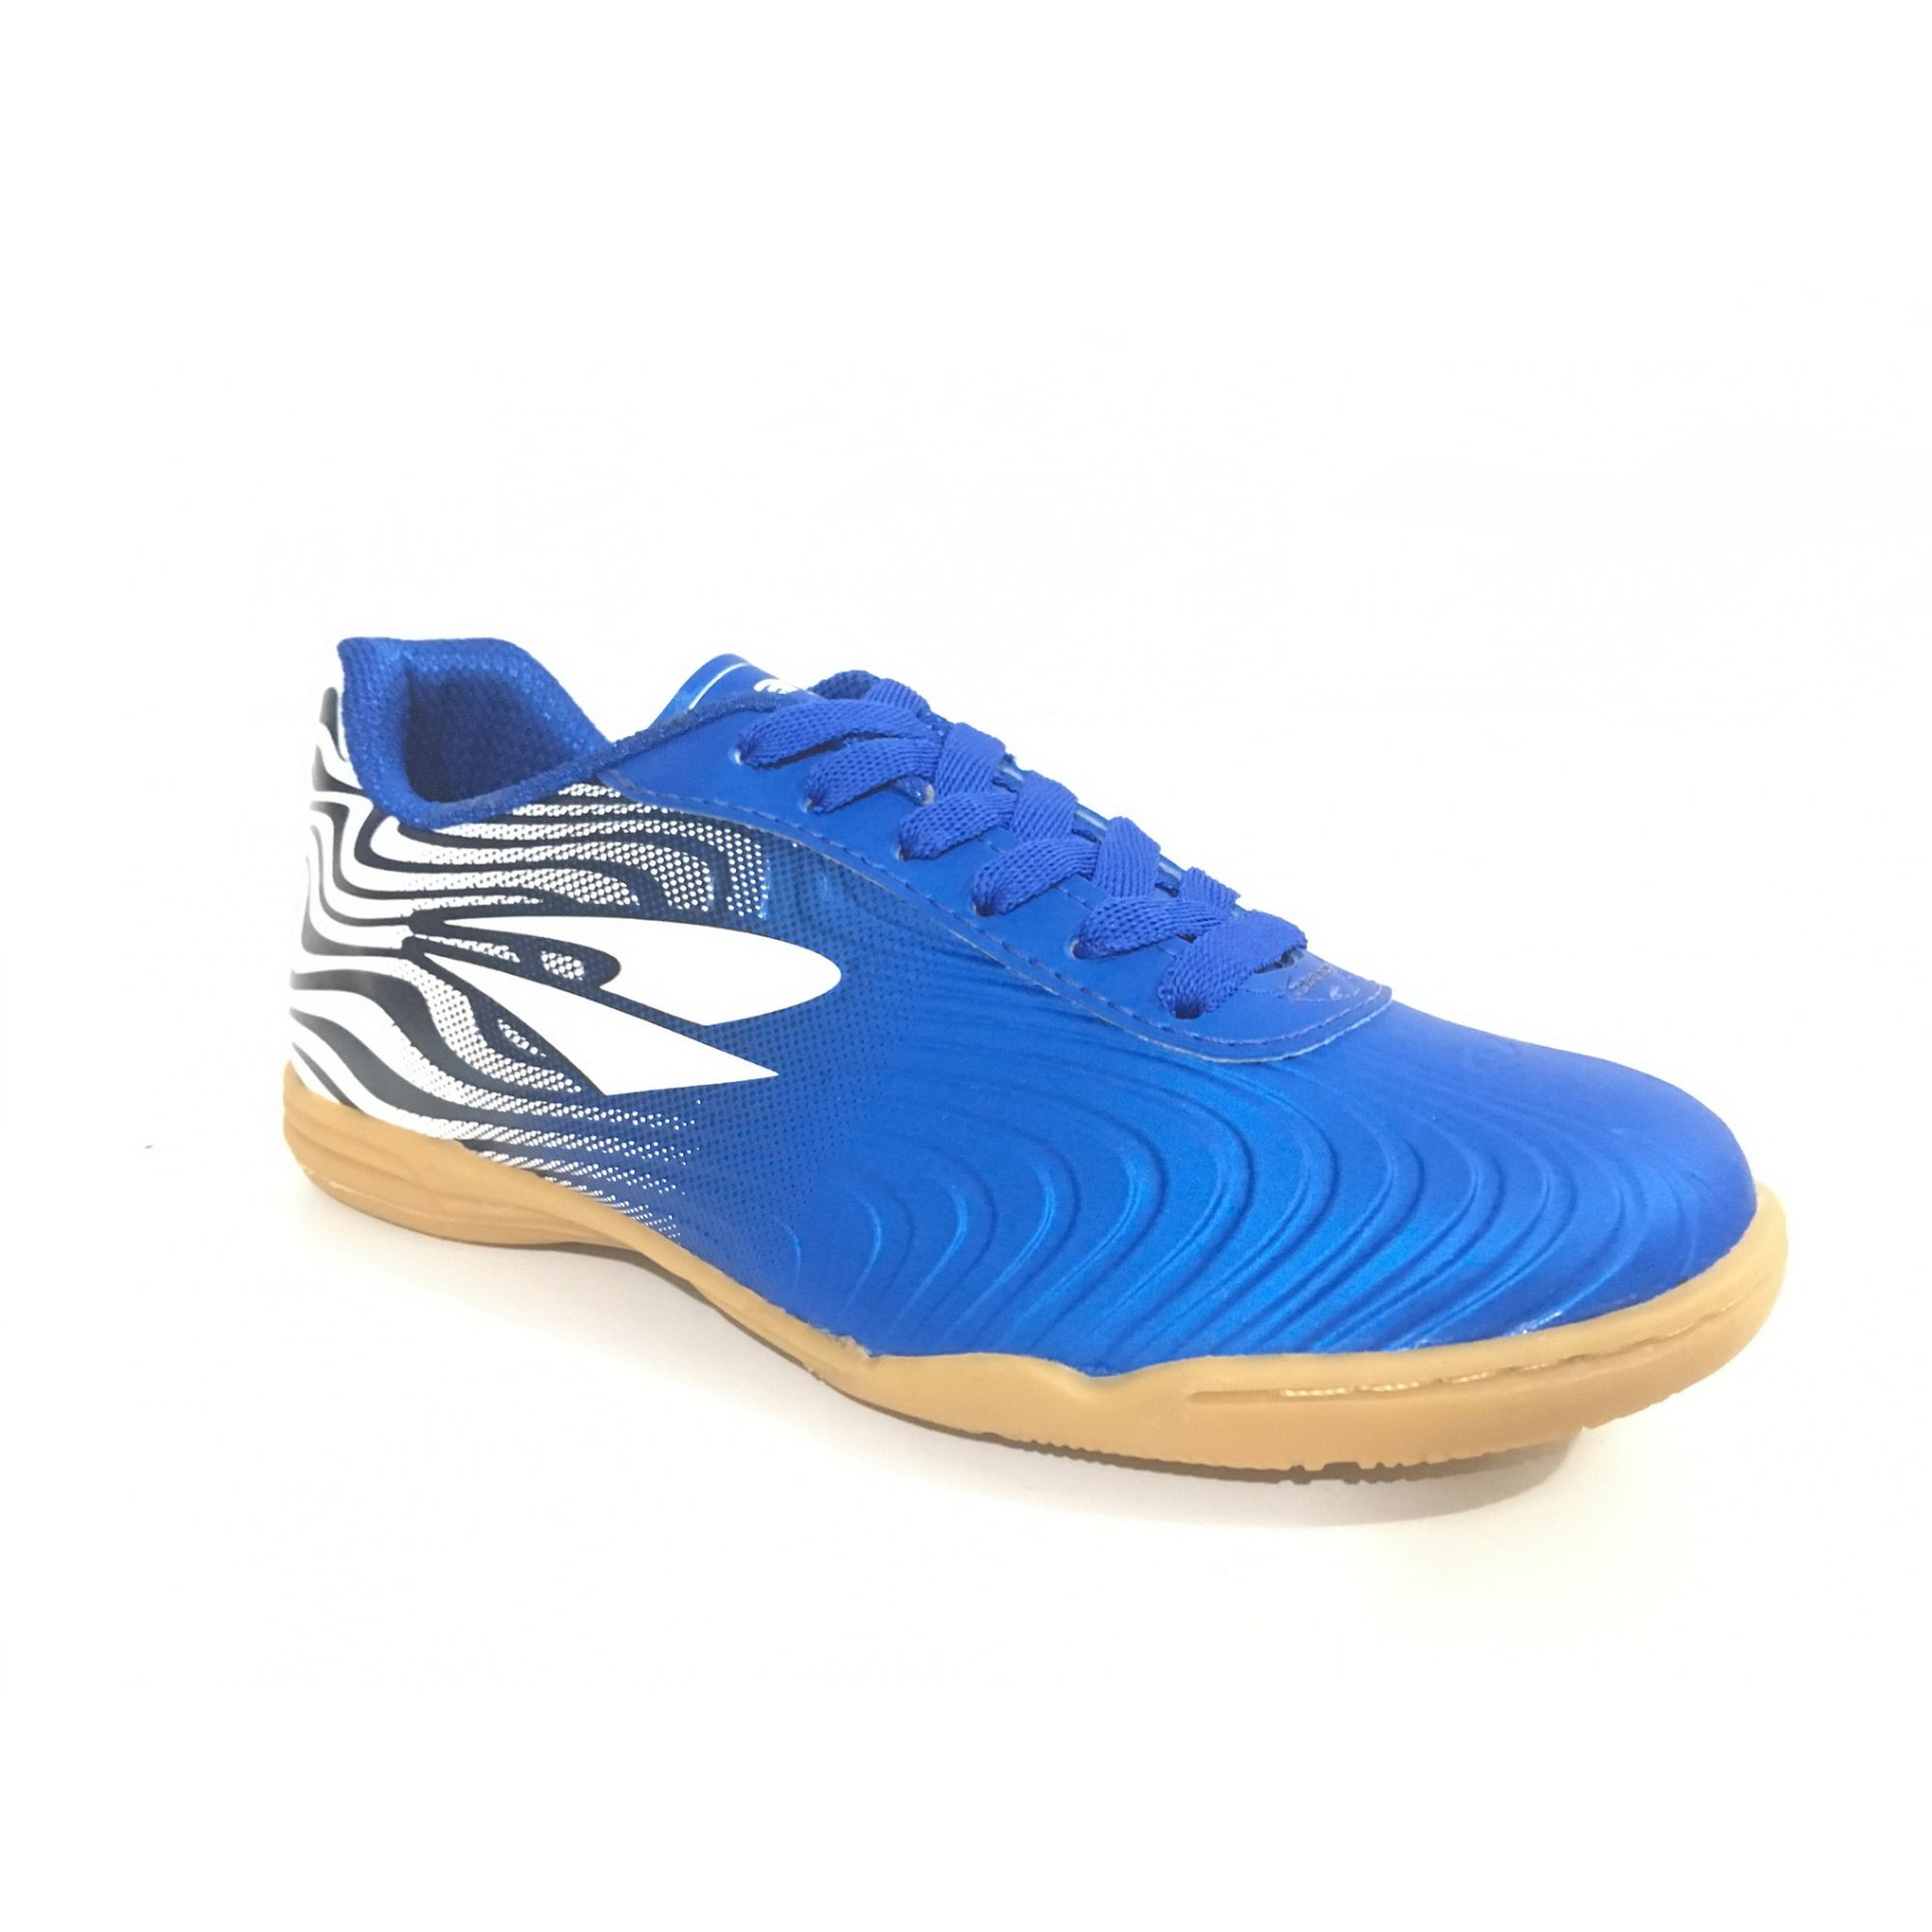 Chuteira Futsal Dray Topfly X2 Infantil - Azul/Branco